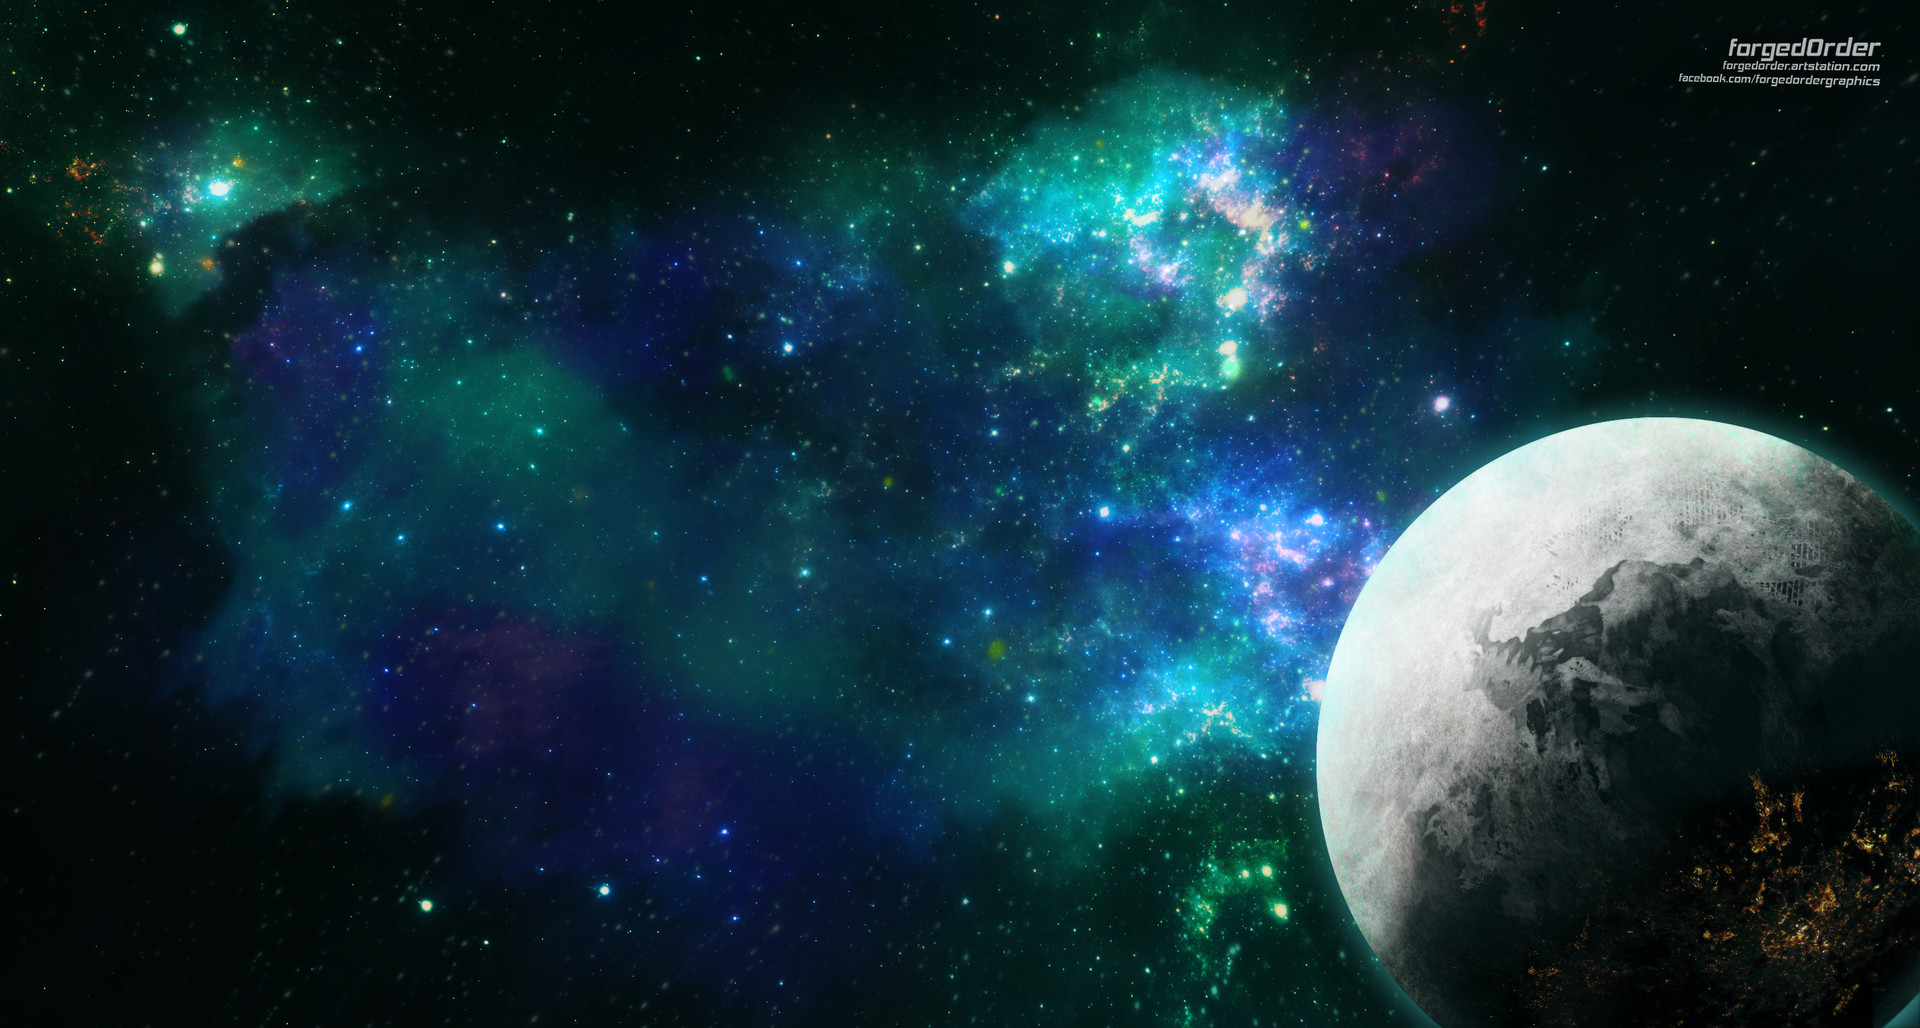 Attila gallik forgedorder nebulae x